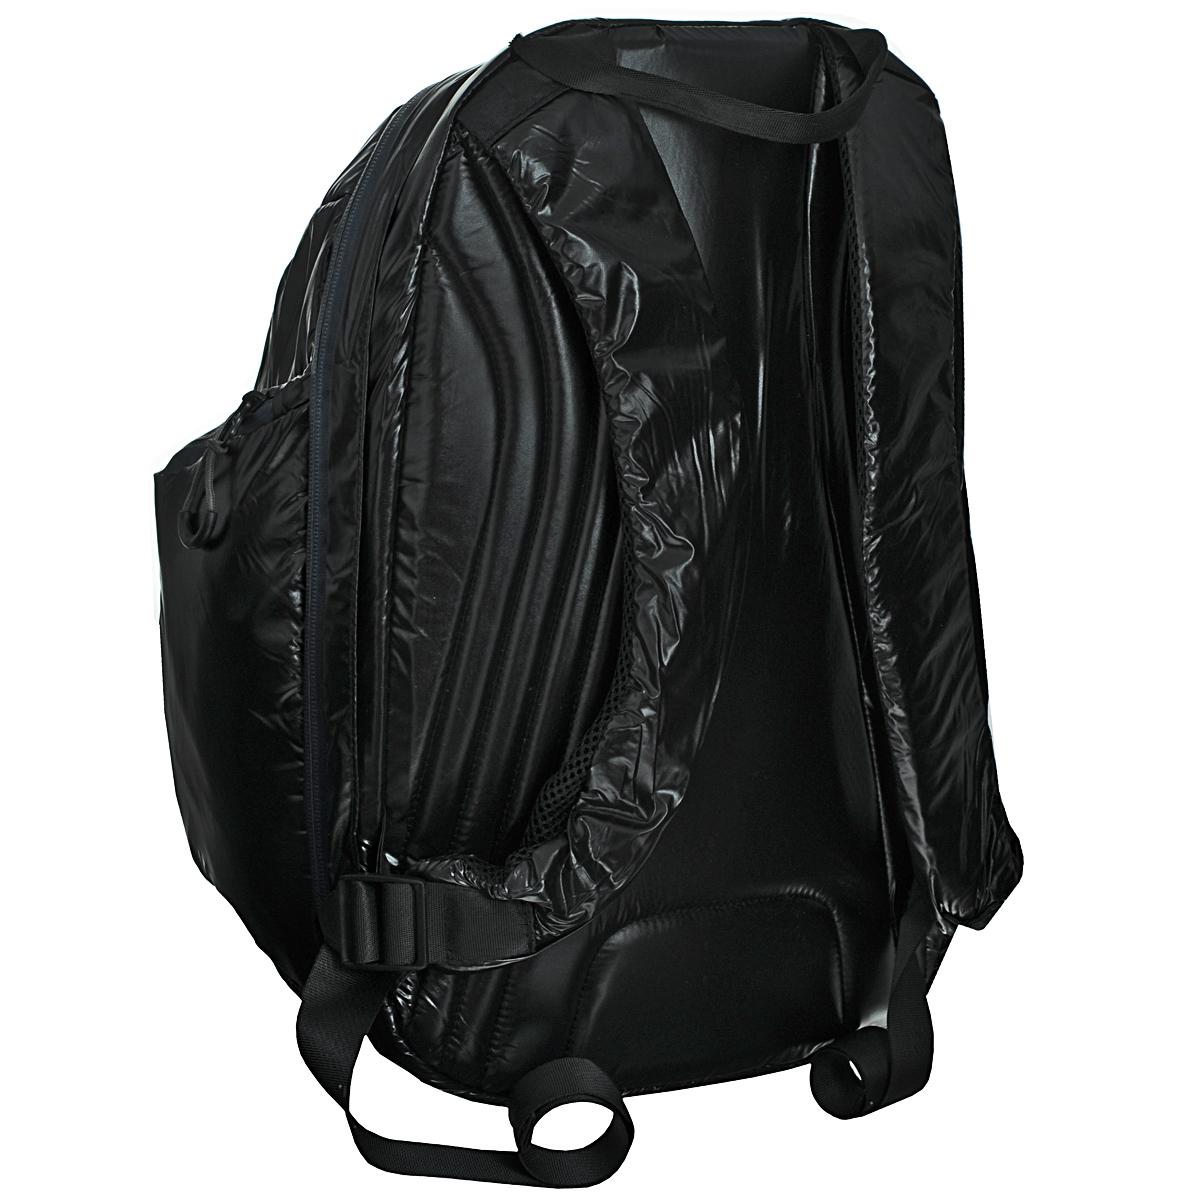 Рюкзак молодежный Grizzly, цвет: черный, серый. RU-417-1 ( RU-417-1 Рюкзак /2 черный - серый )